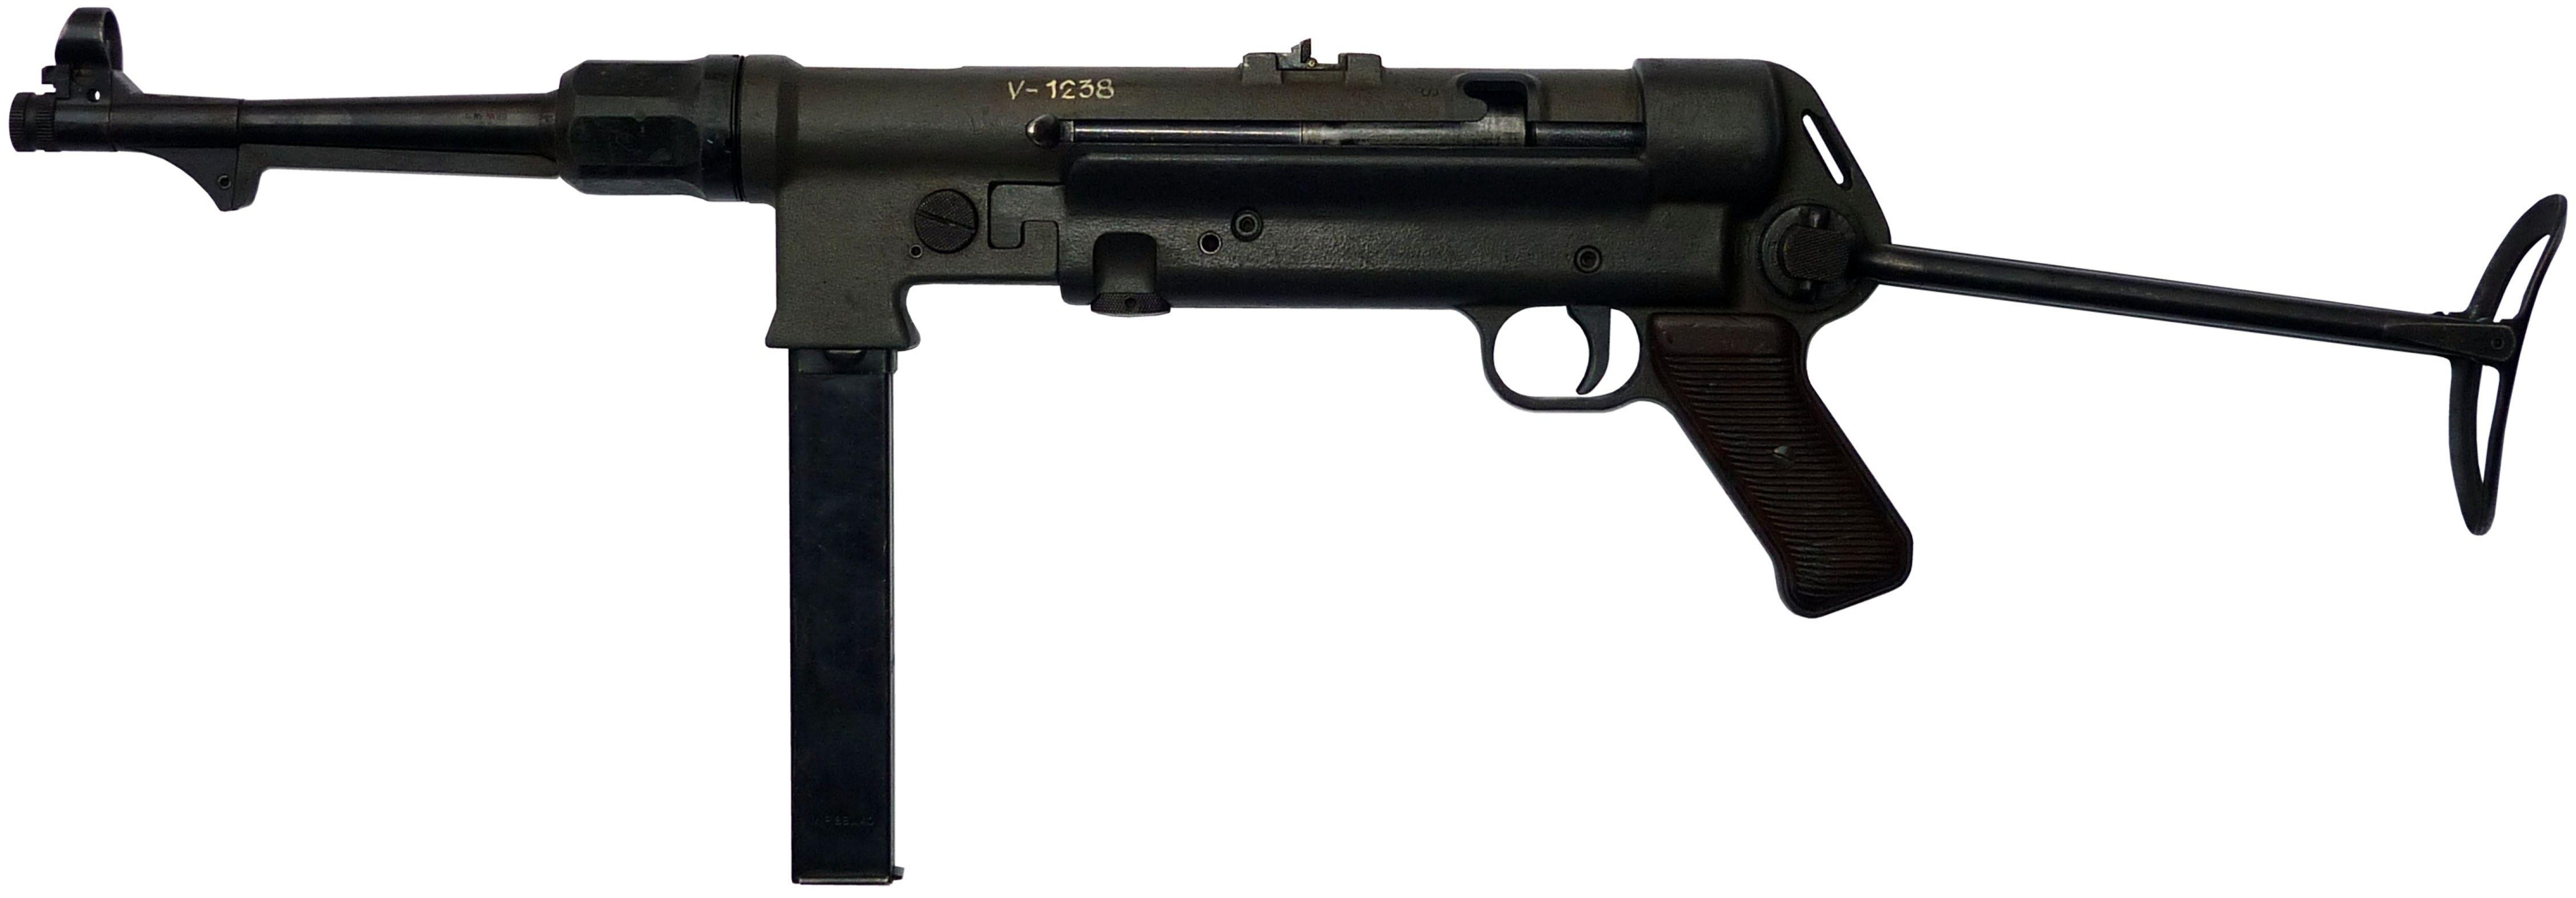 the mp38 l with stock folded sub machine gun pinterest guns rh pinterest com Kriss Vector Super V USA KWA KRISS Vector GBB